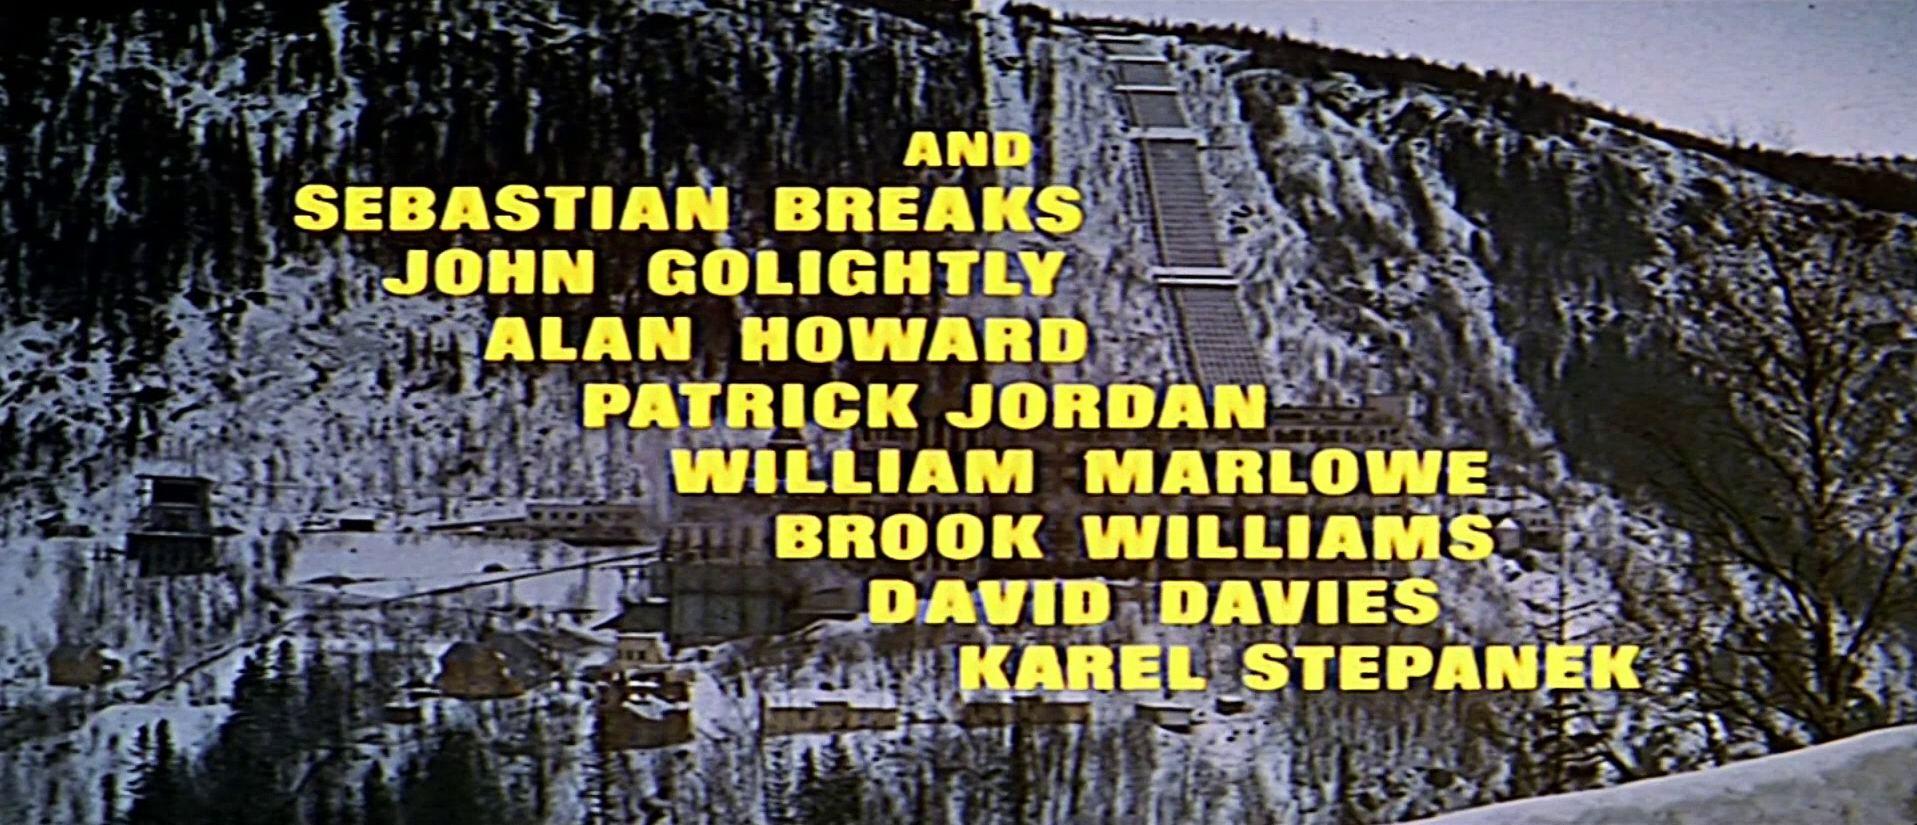 Main title from The Heroes of Telemark (1965) (7). And Sebastian Breaks, John Golightly, Alan Howard, Patrick Jordan, William Marlowe, Brook Williams